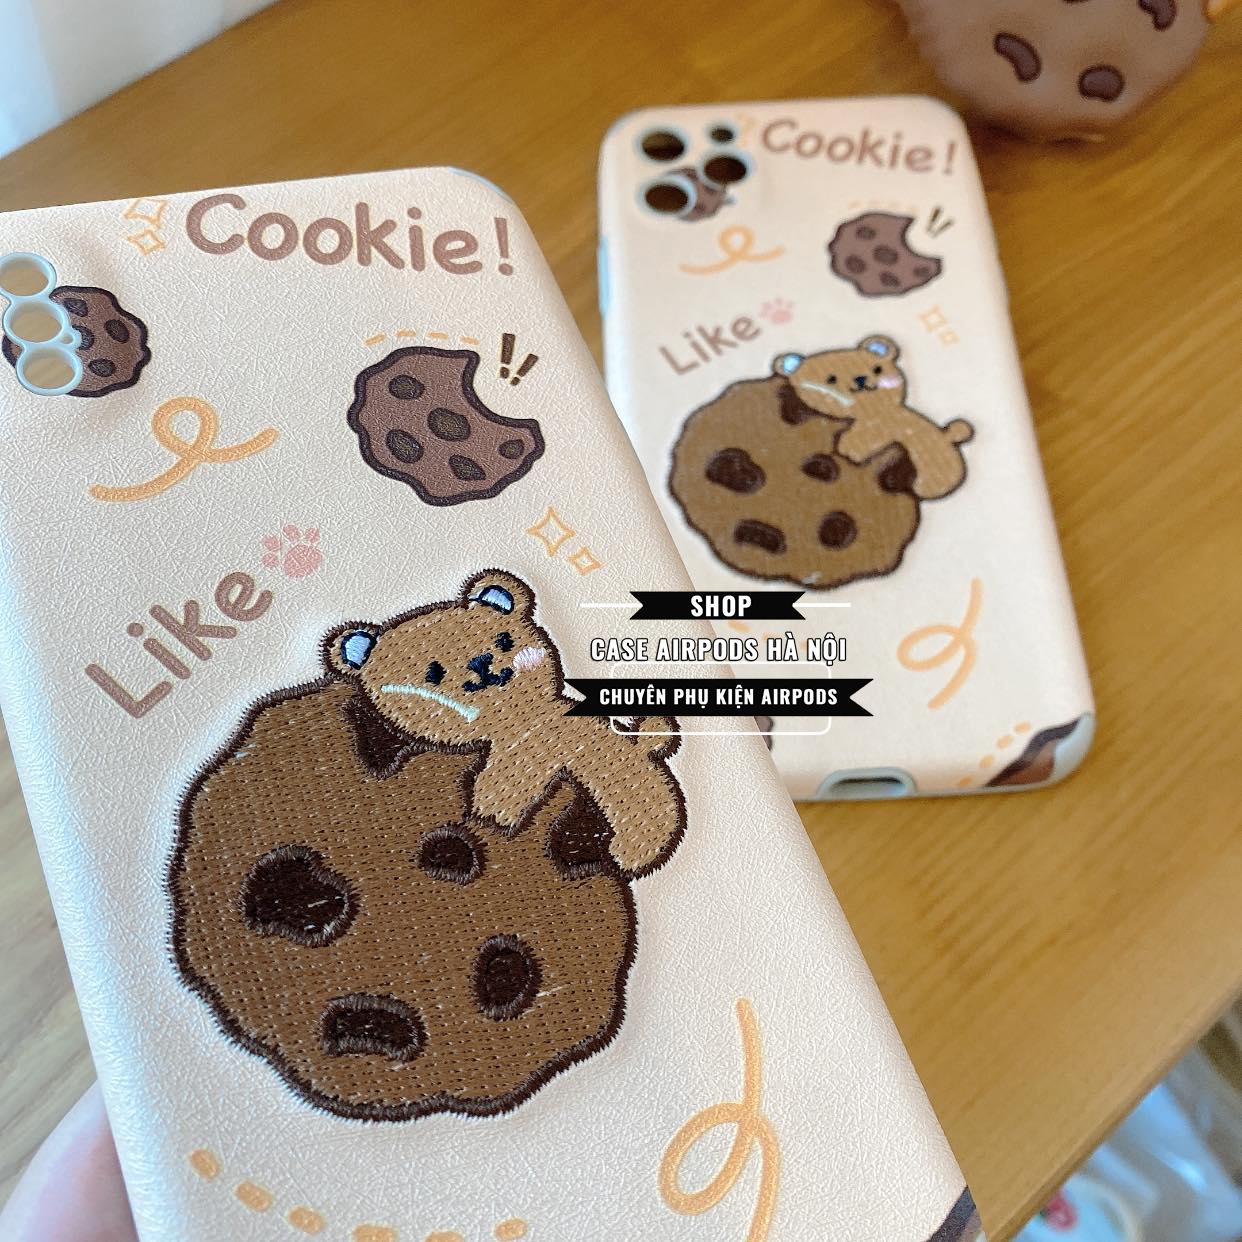 Ốp IPhone Cookie Thêu